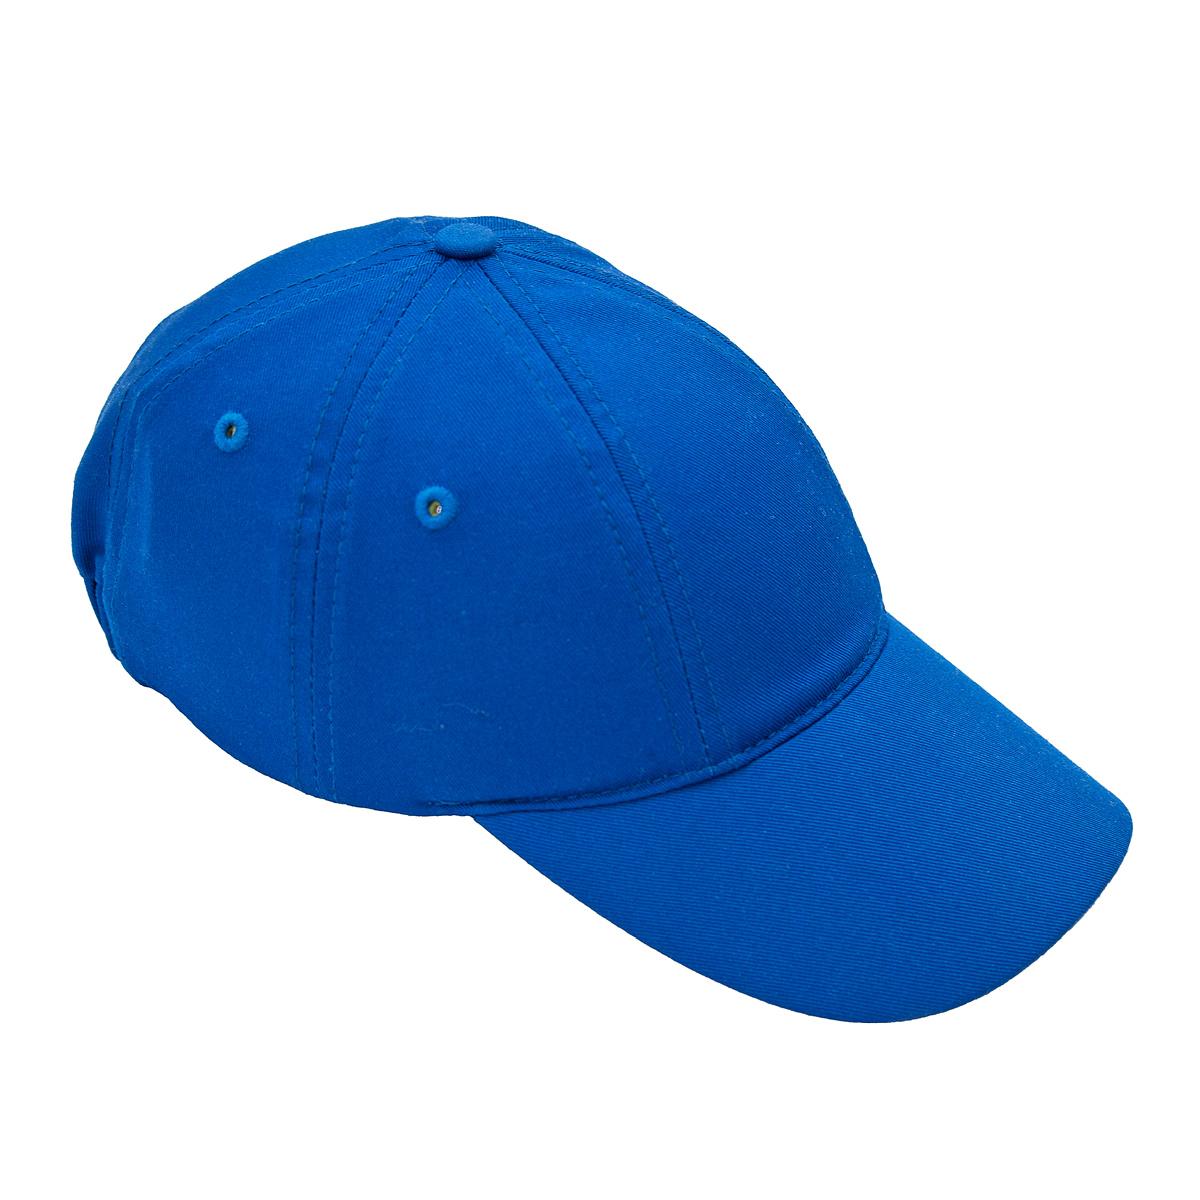 Каскетка защитная (цвет синий)